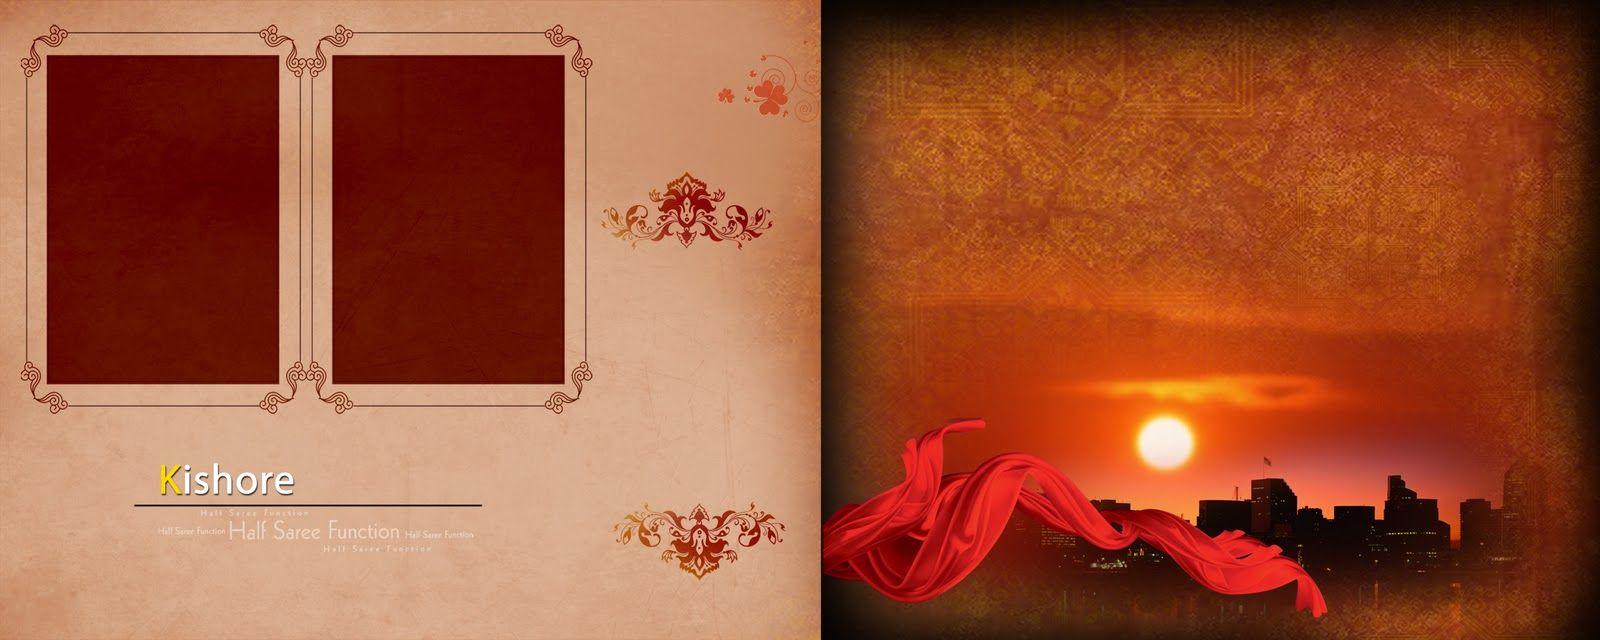 ... Wedding Background Hd karizma album 12x36 psd wedding background free